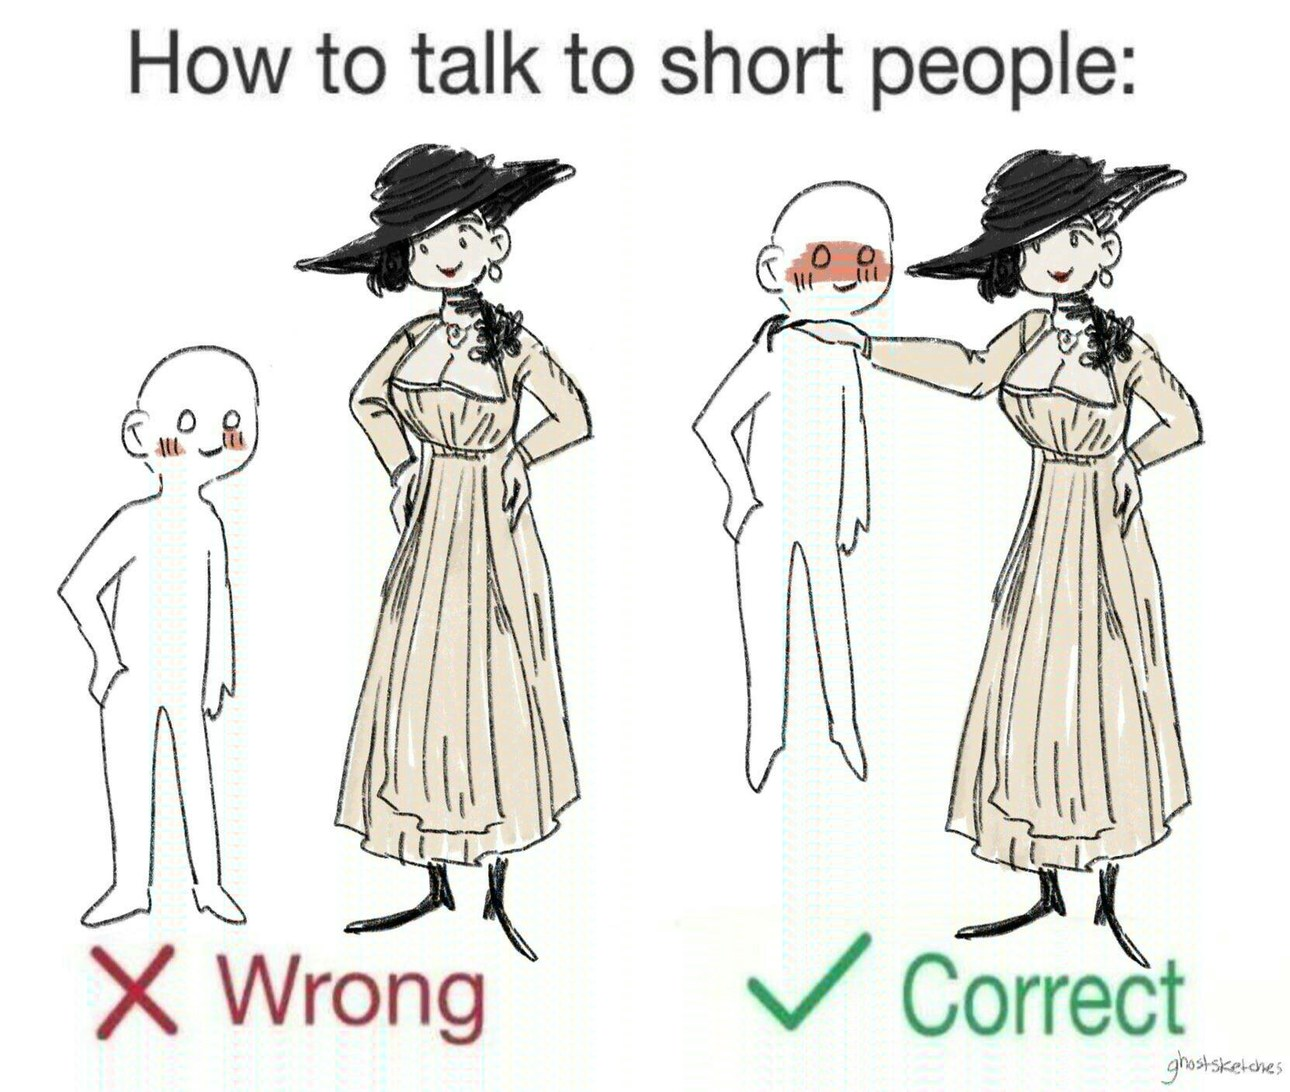 5665 - meme